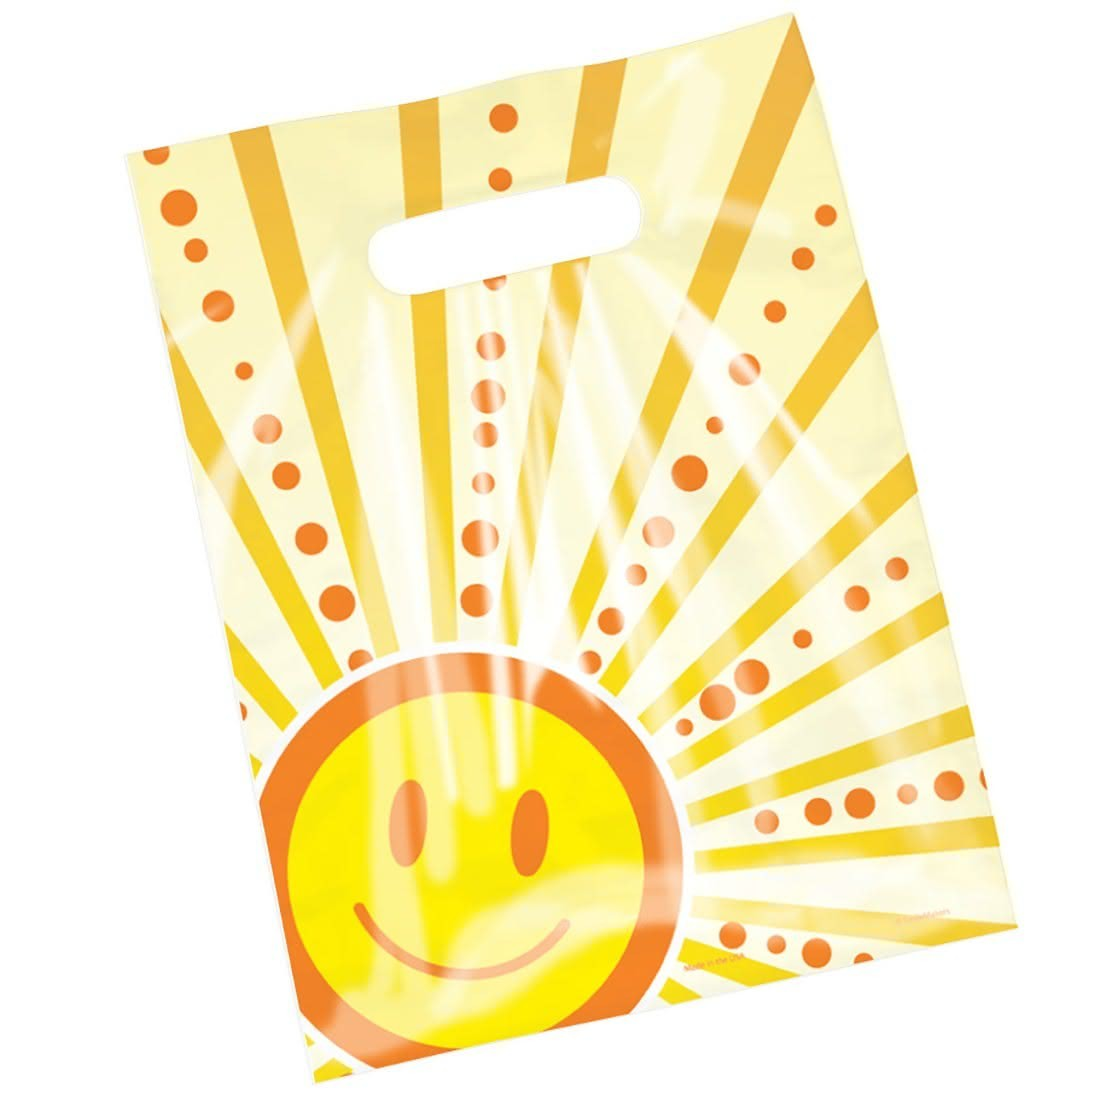 Scatter Smiley Guy Sunshine Bags [image]